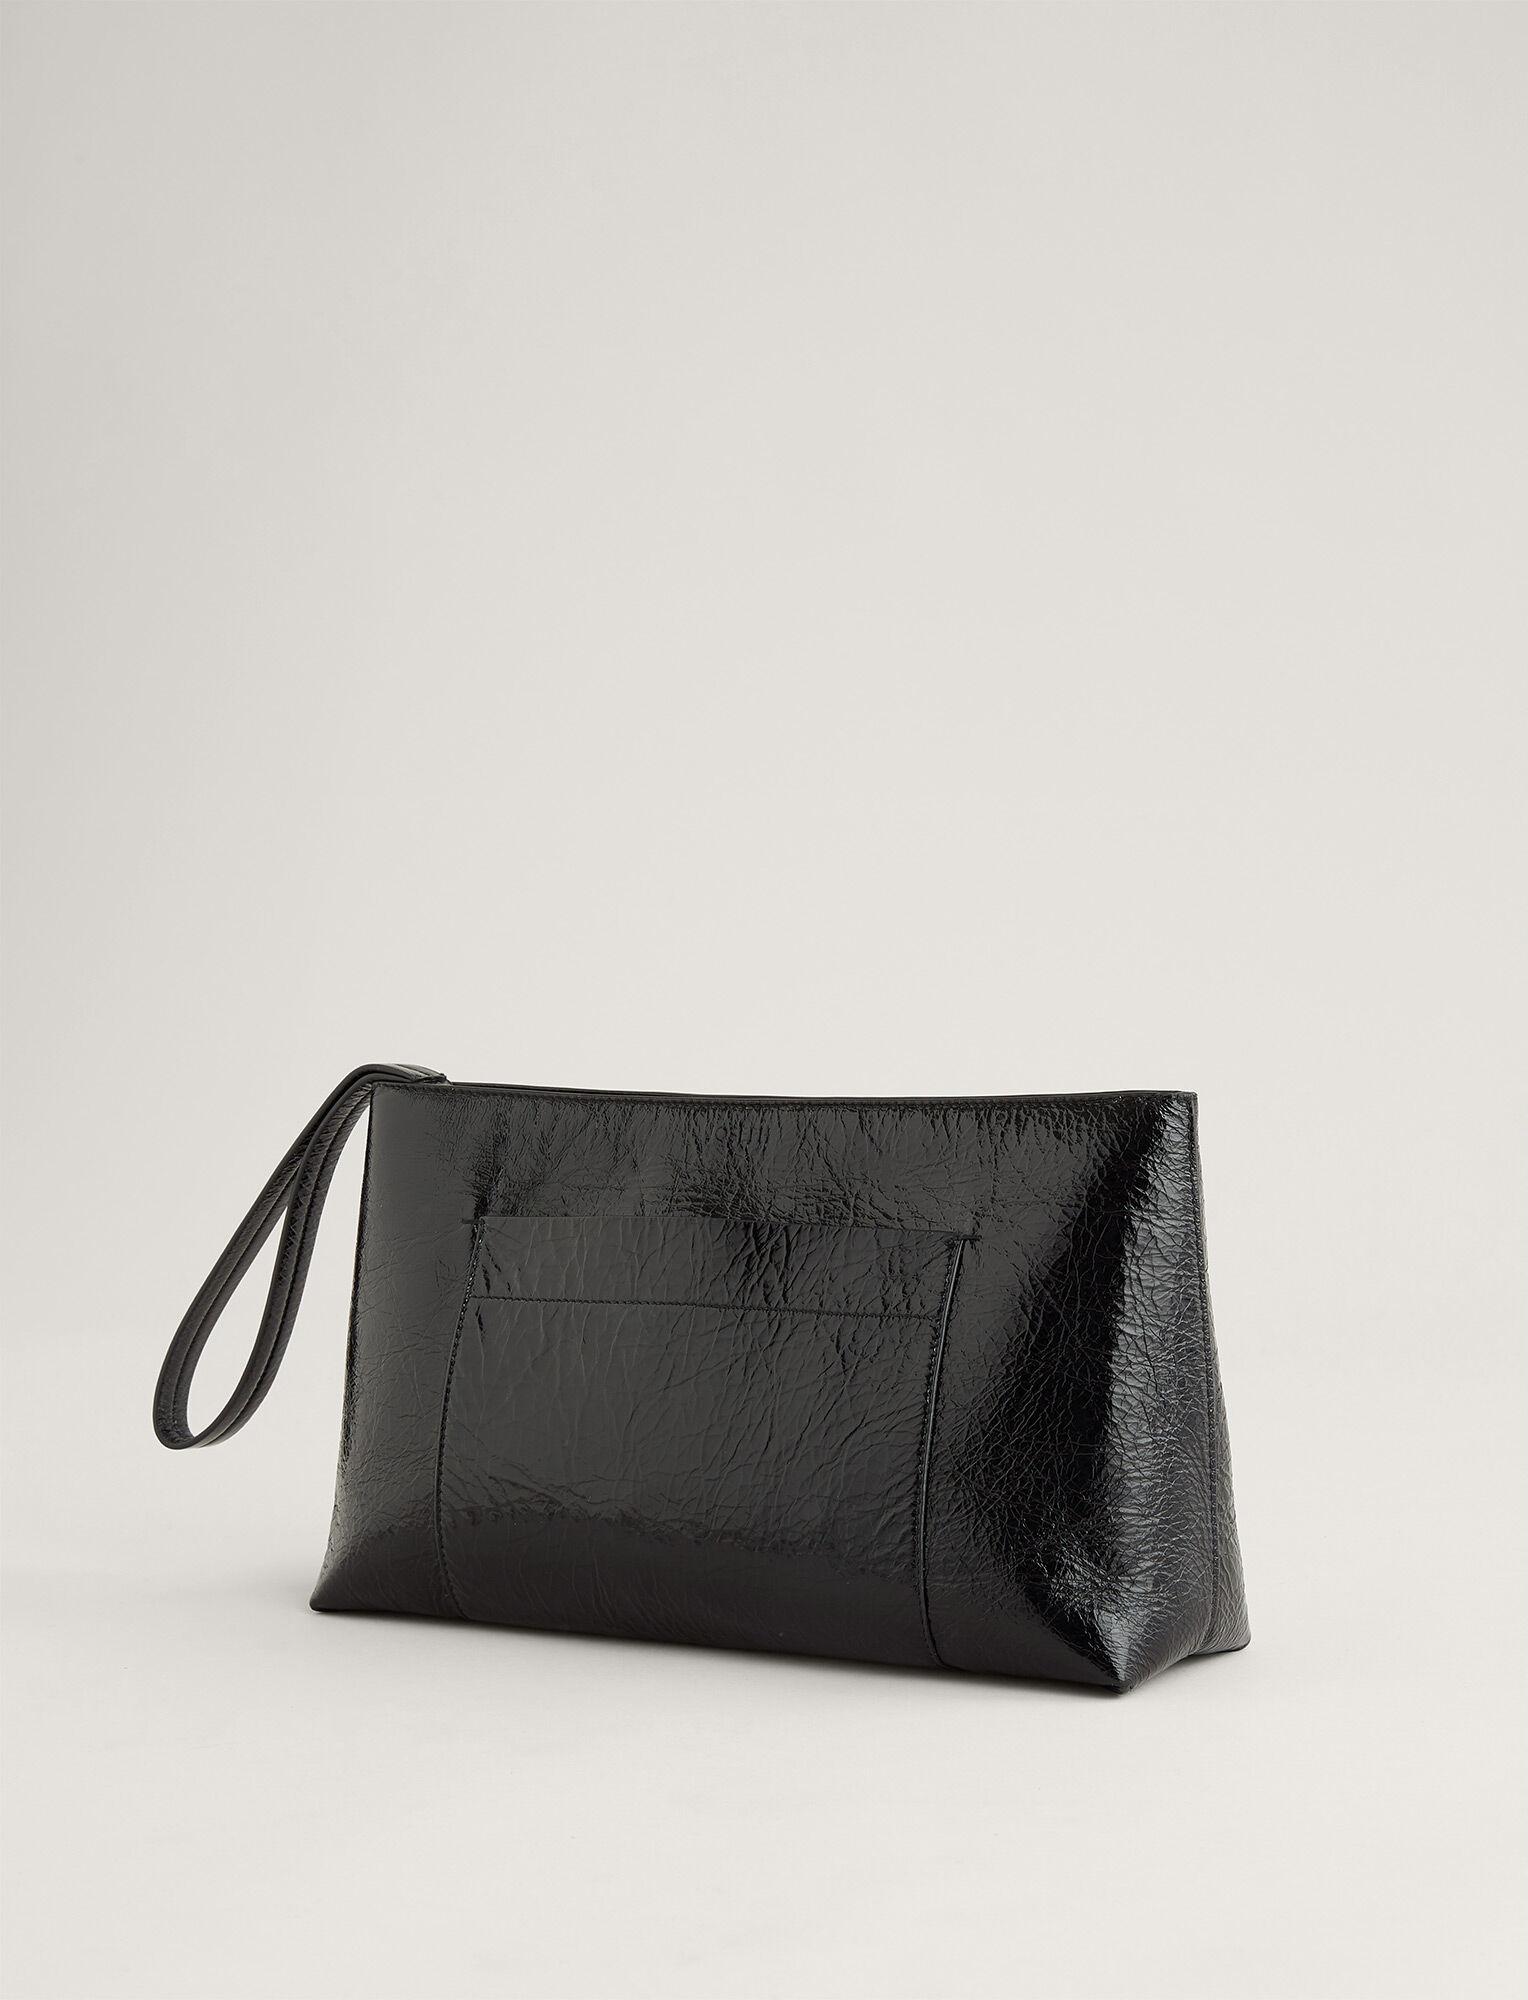 Joseph, Westbourne Clutch Leather Bag, in BLACK